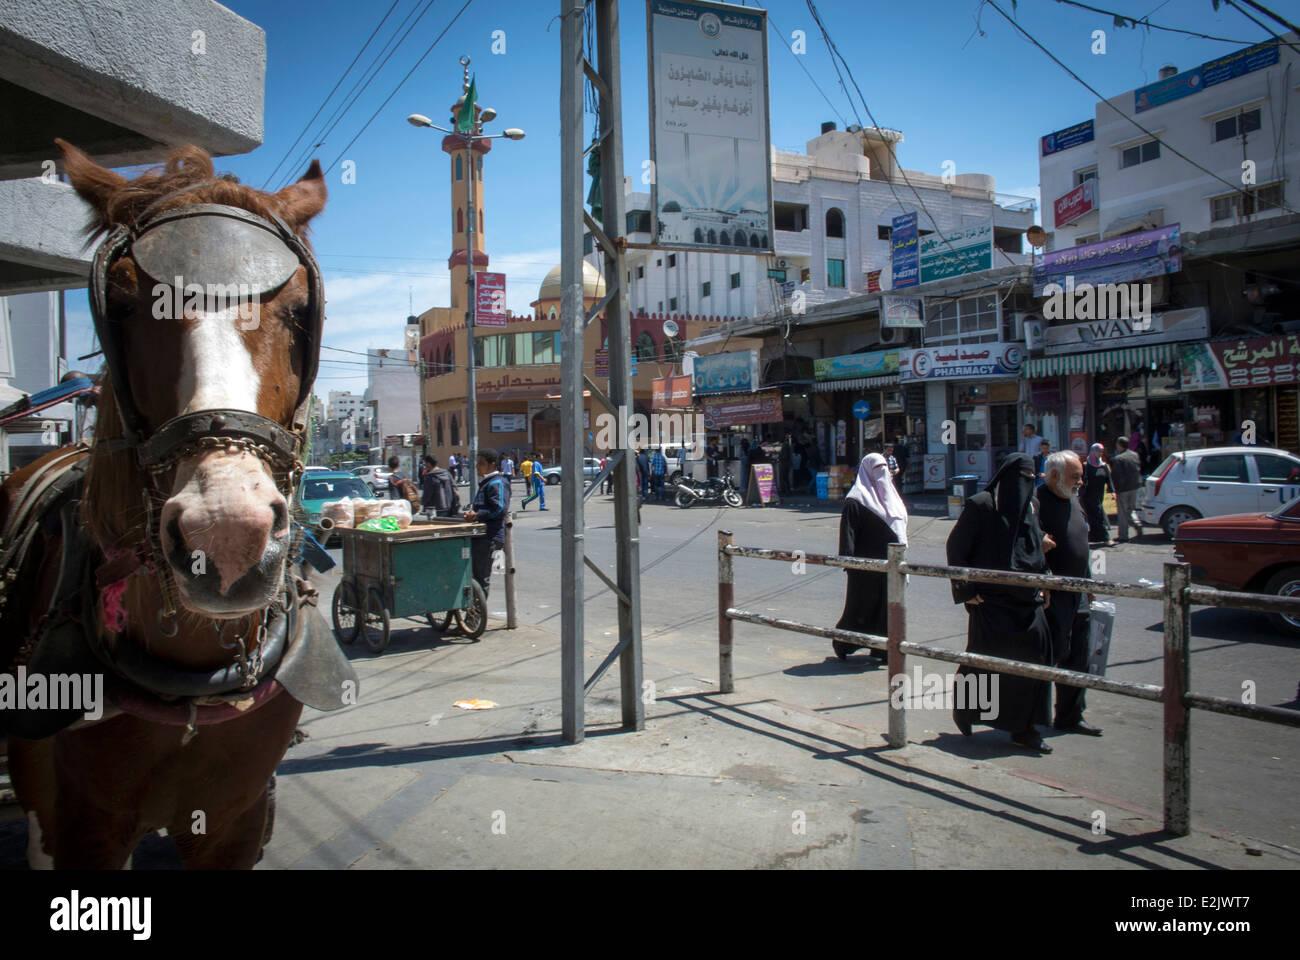 Street Scene near the Al Shifa Hospital, Gaza City, Palestine. - Stock Image